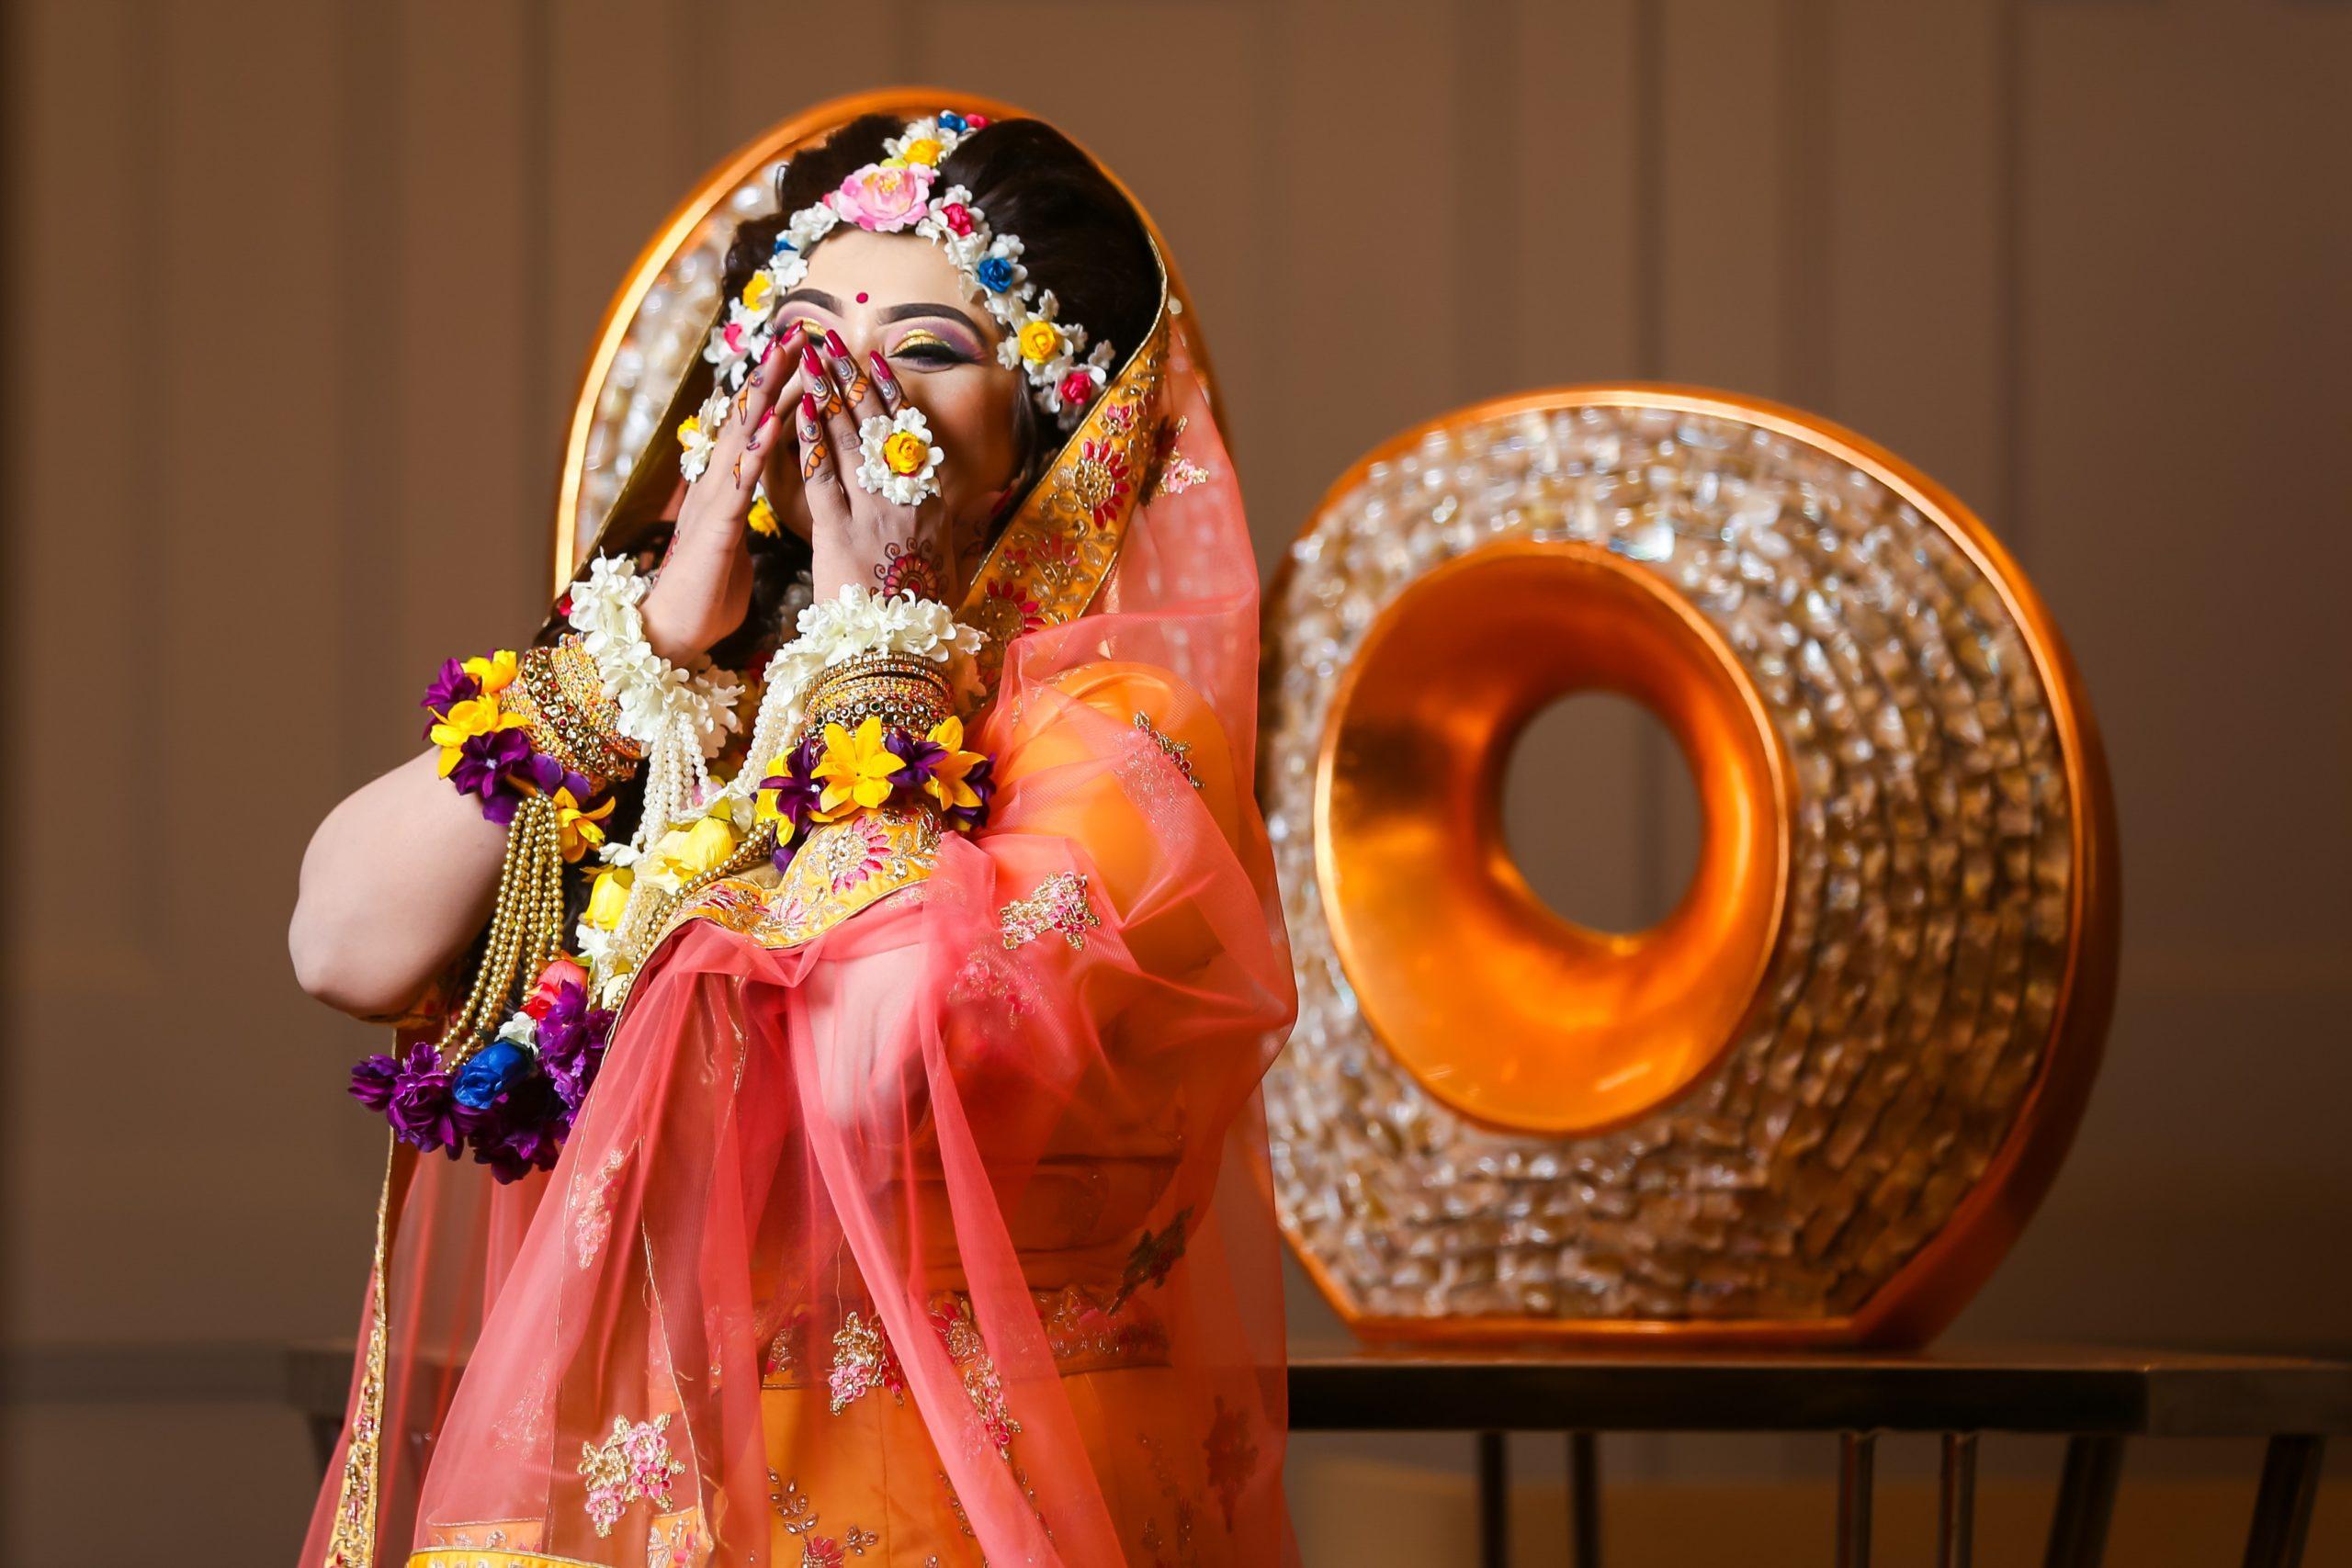 Ideas For A Diy Bridal Shower Decorations